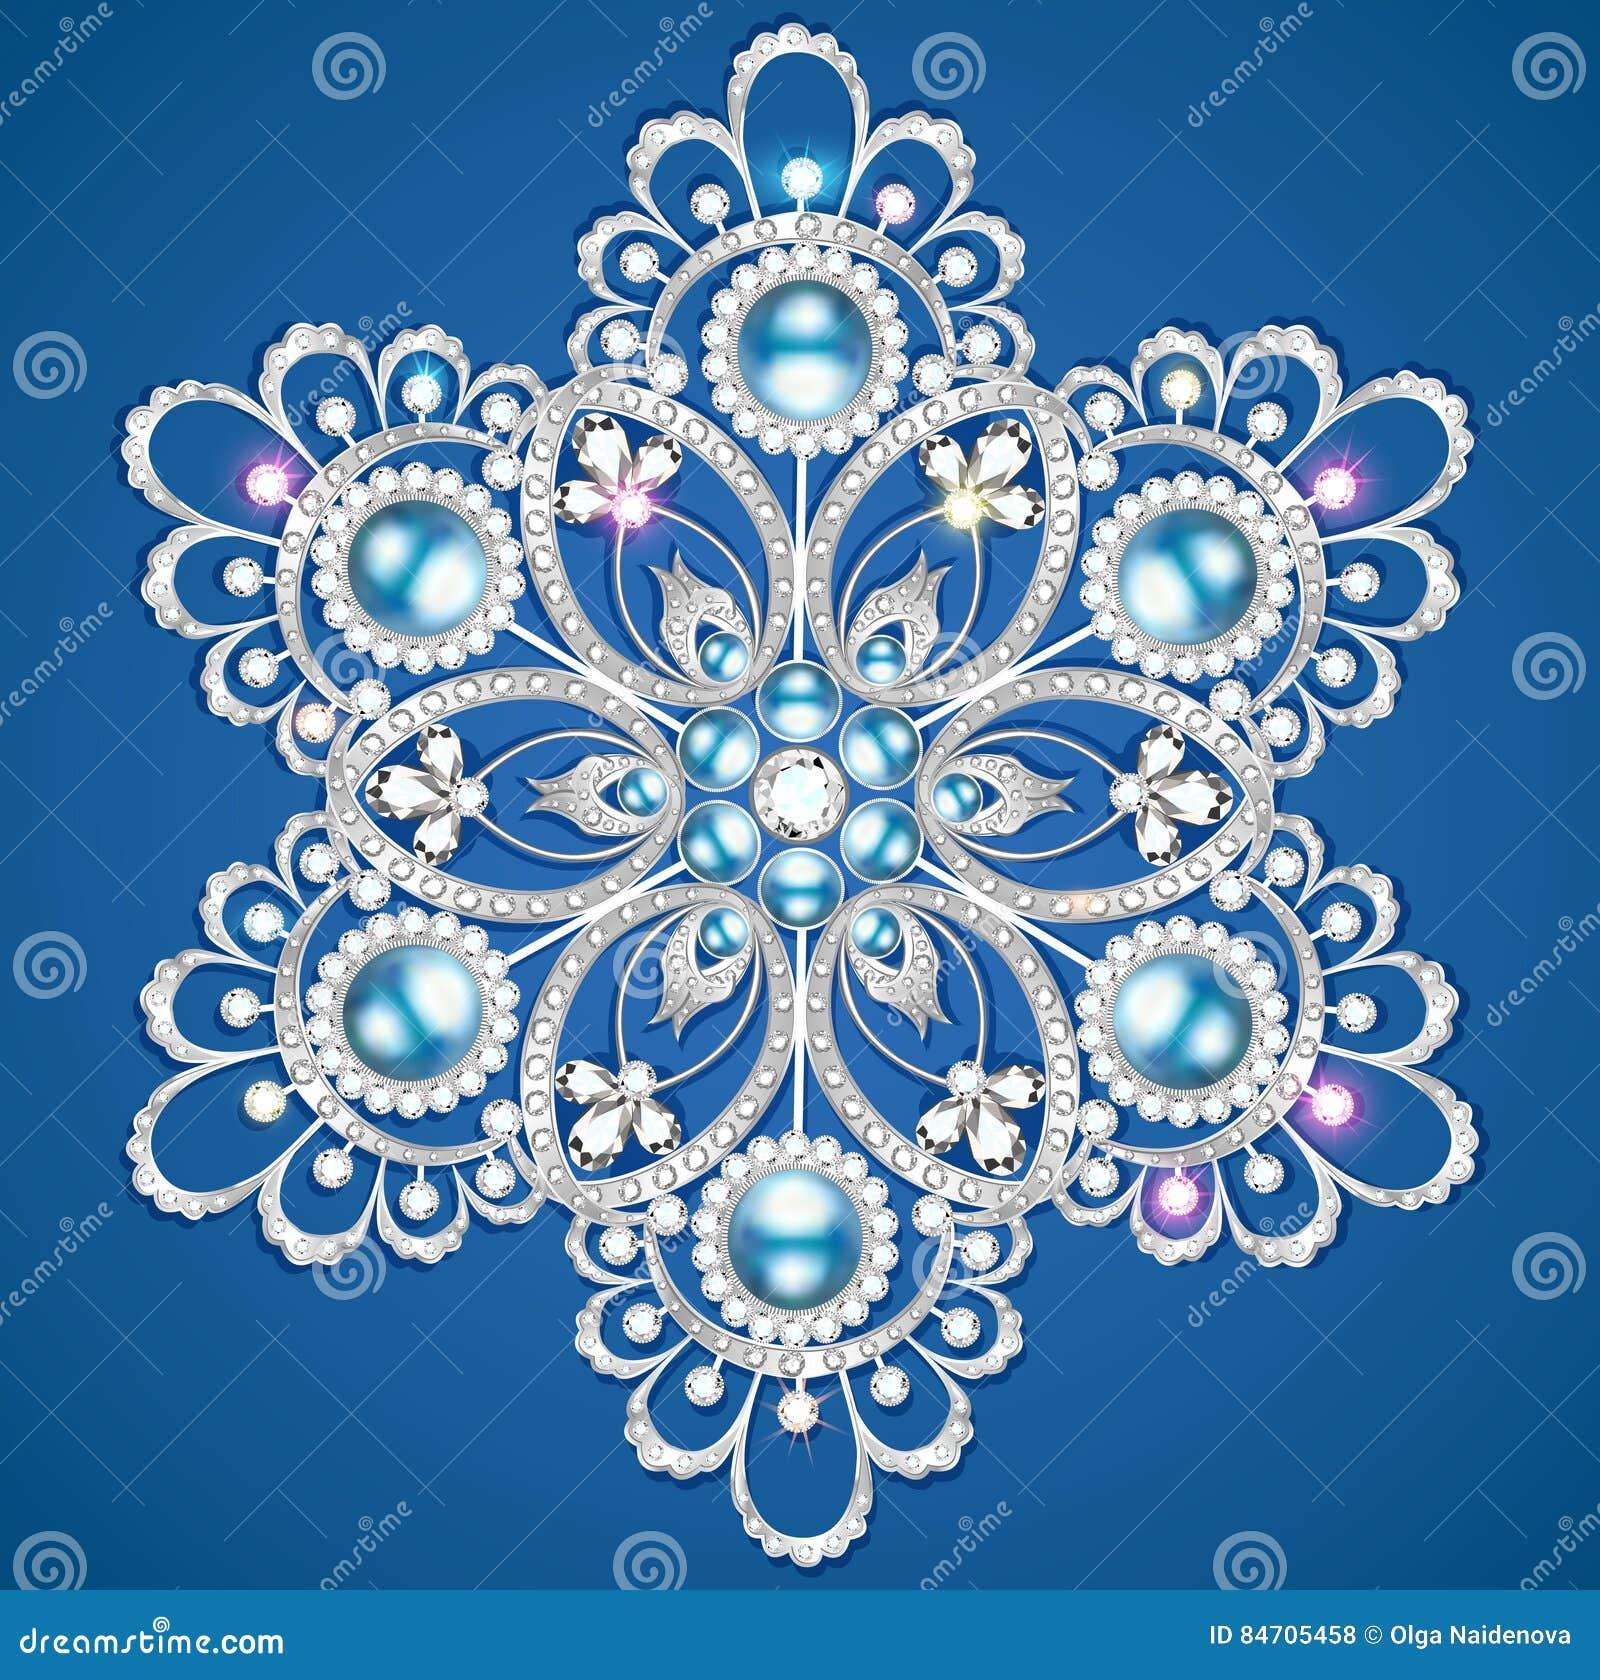 Mandala brooch jewelry, design element.